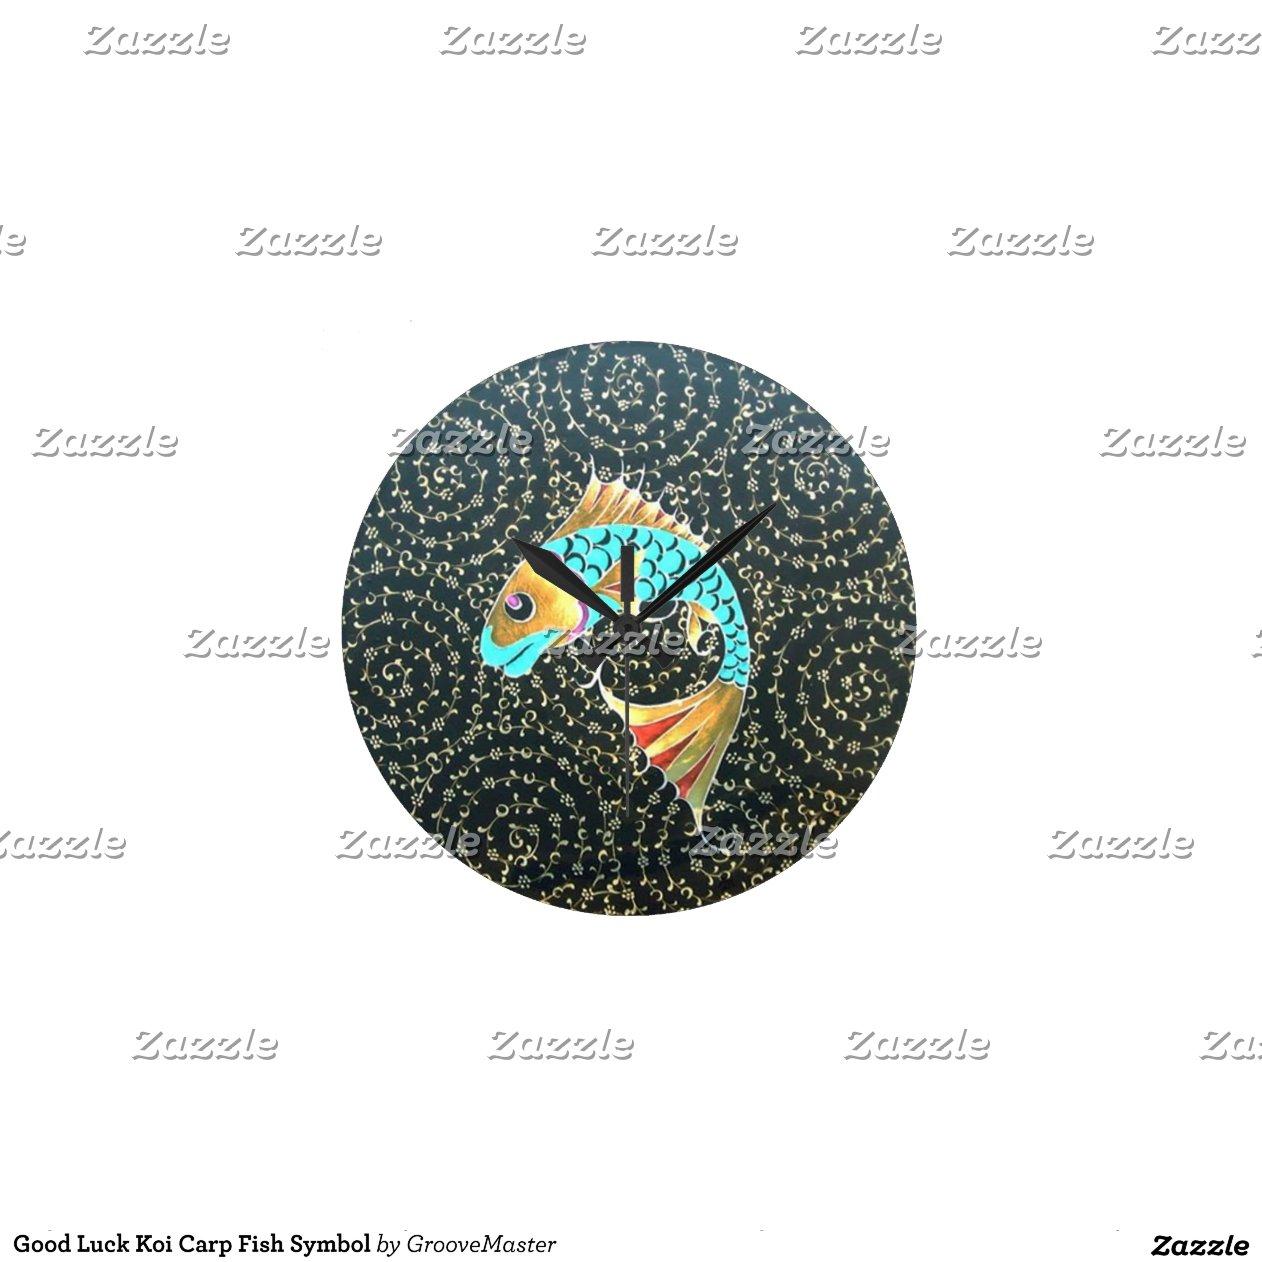 Good luck koi carp fish symbol wall clocks zazzle for Koi fish representation